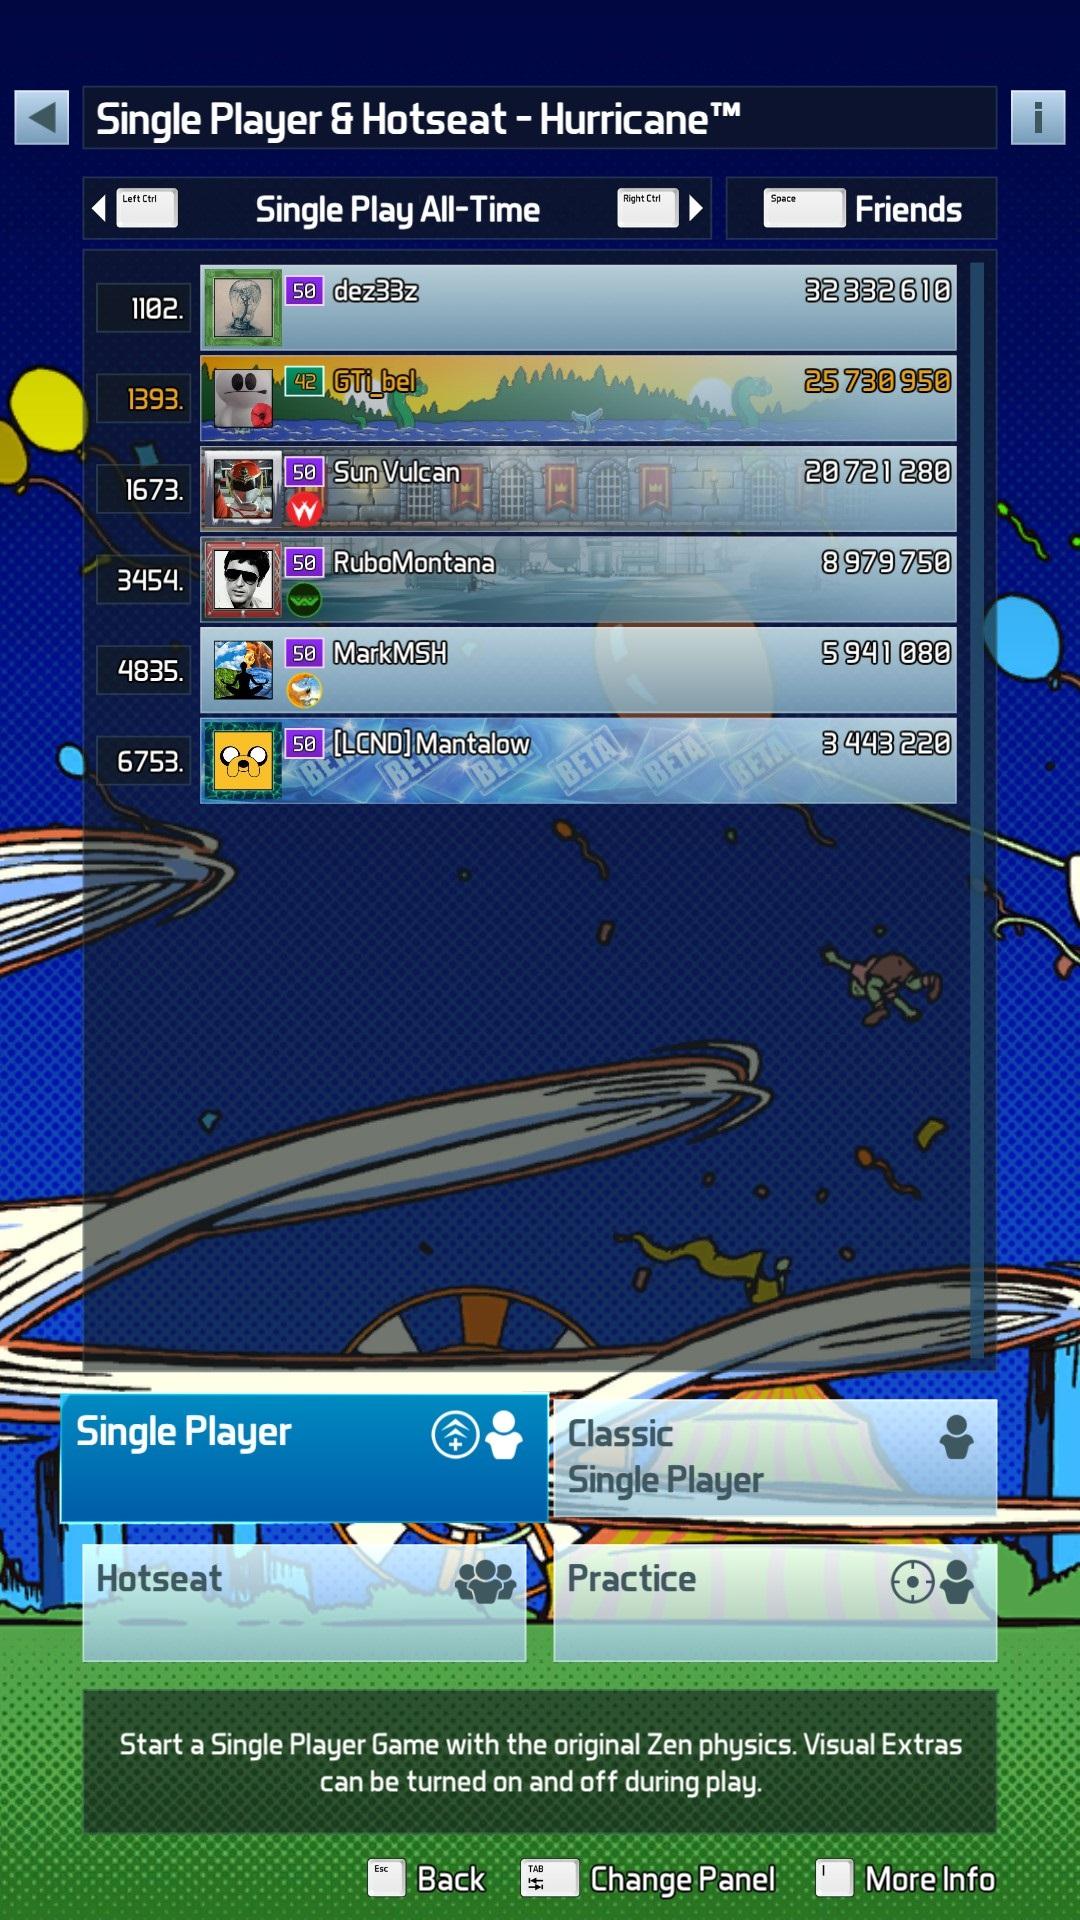 GTibel: Pinball FX3: Hurricane [Standard] (PC) 25,730,950 points on 2020-01-16 03:57:47